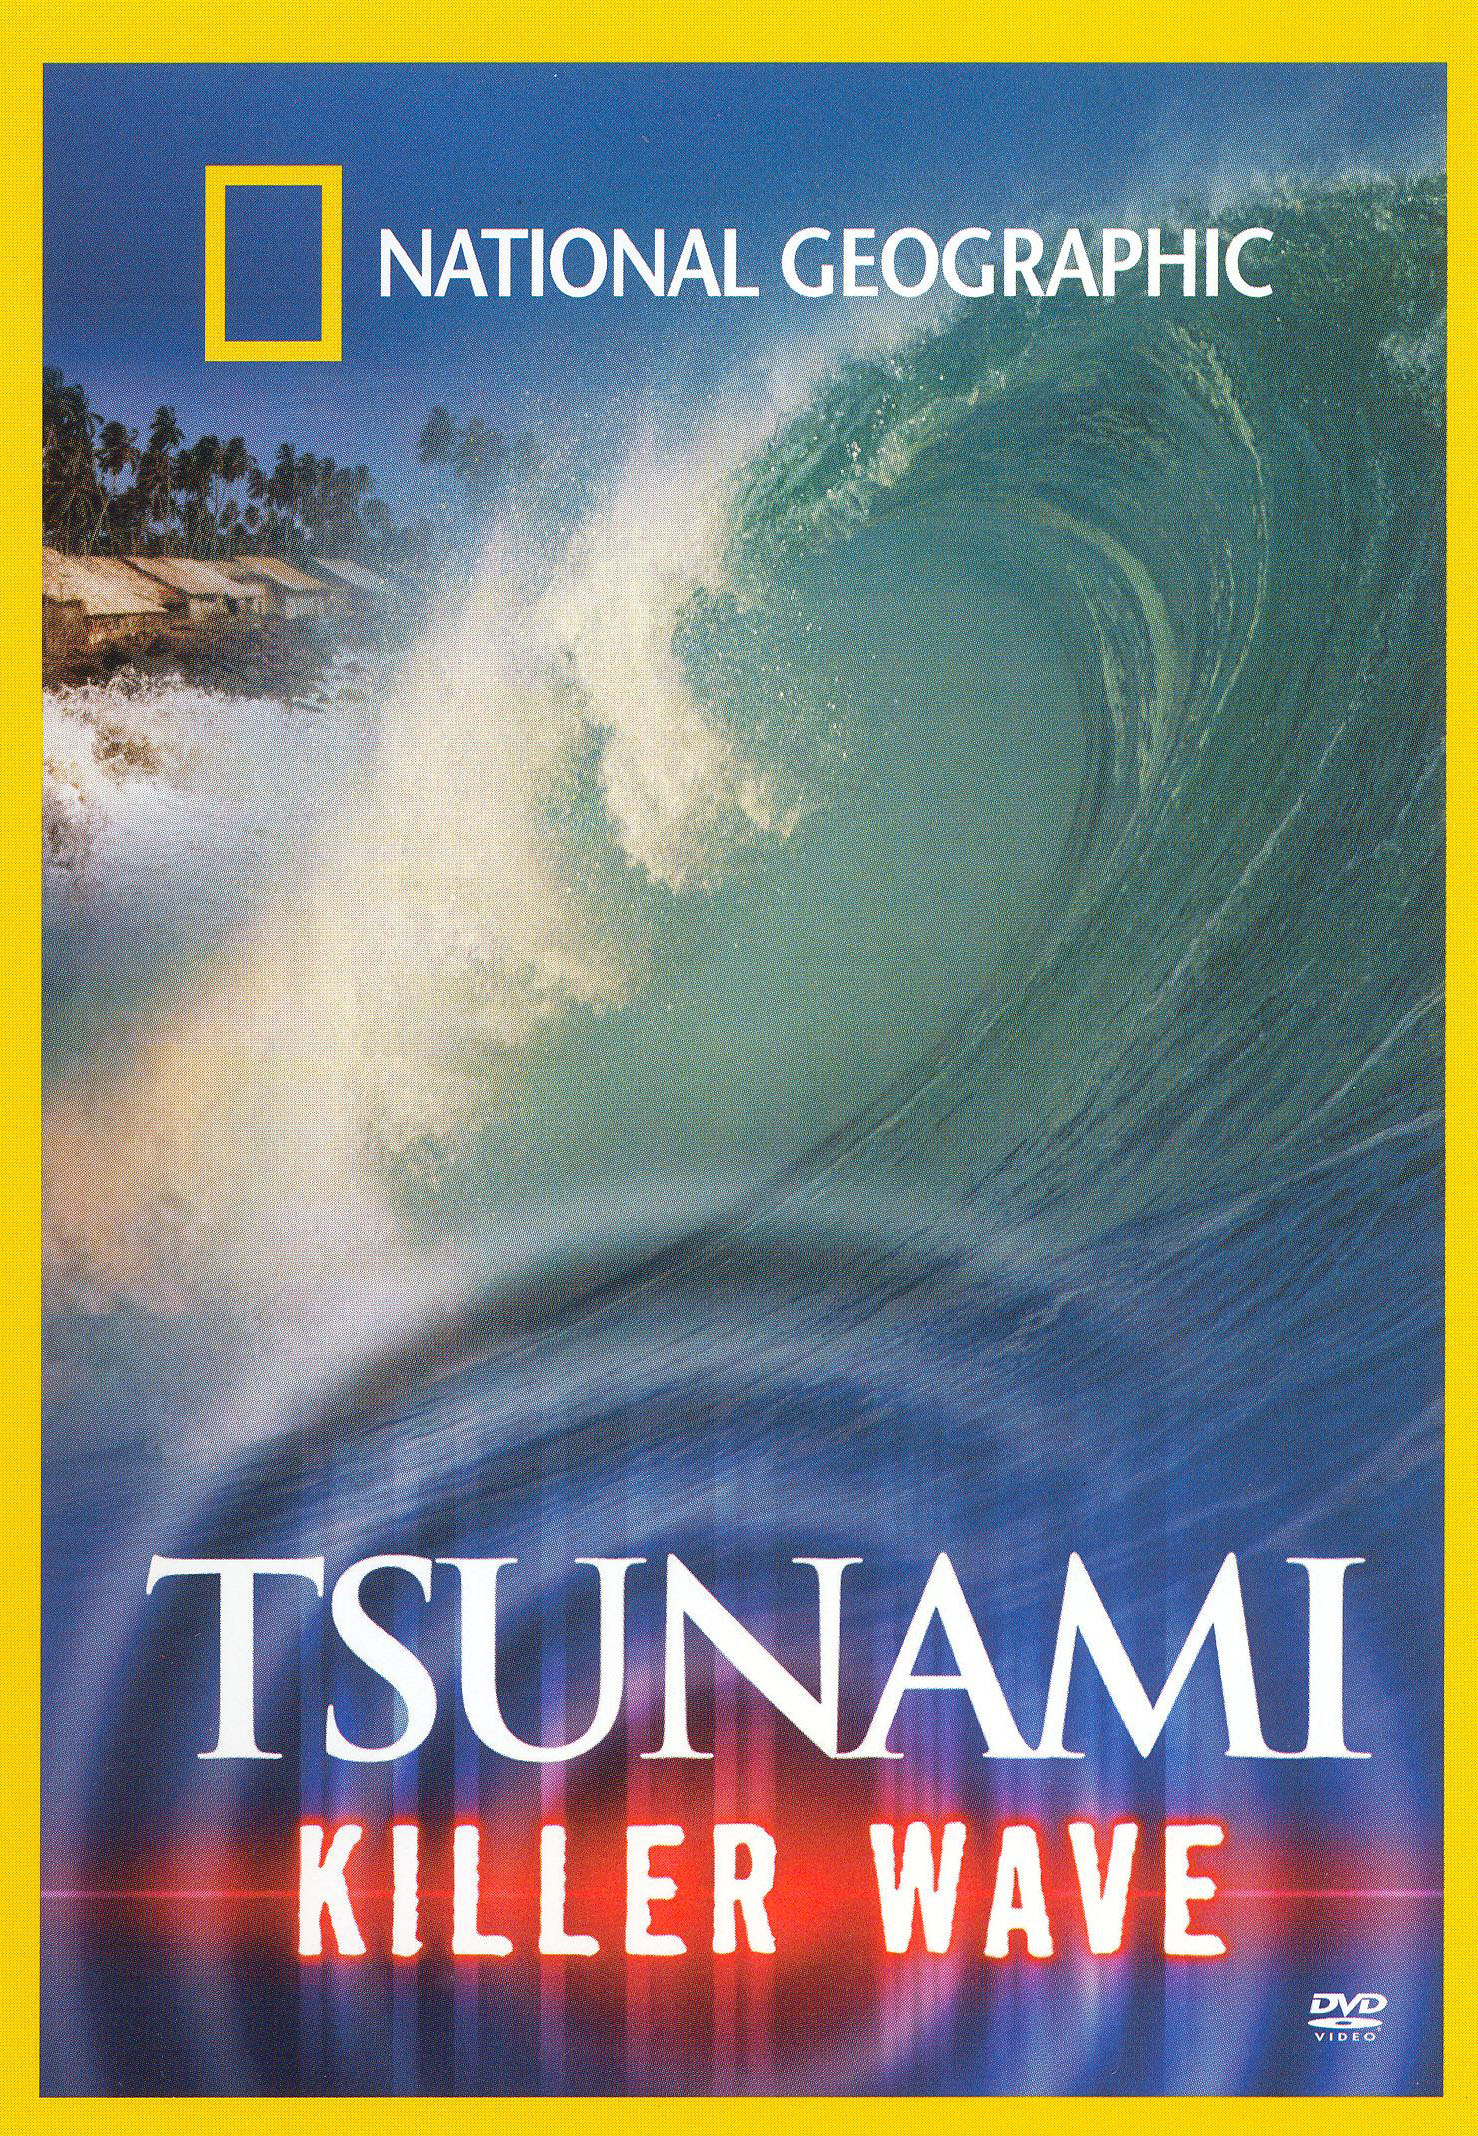 National Geographic: Tsunami - Killer Wave